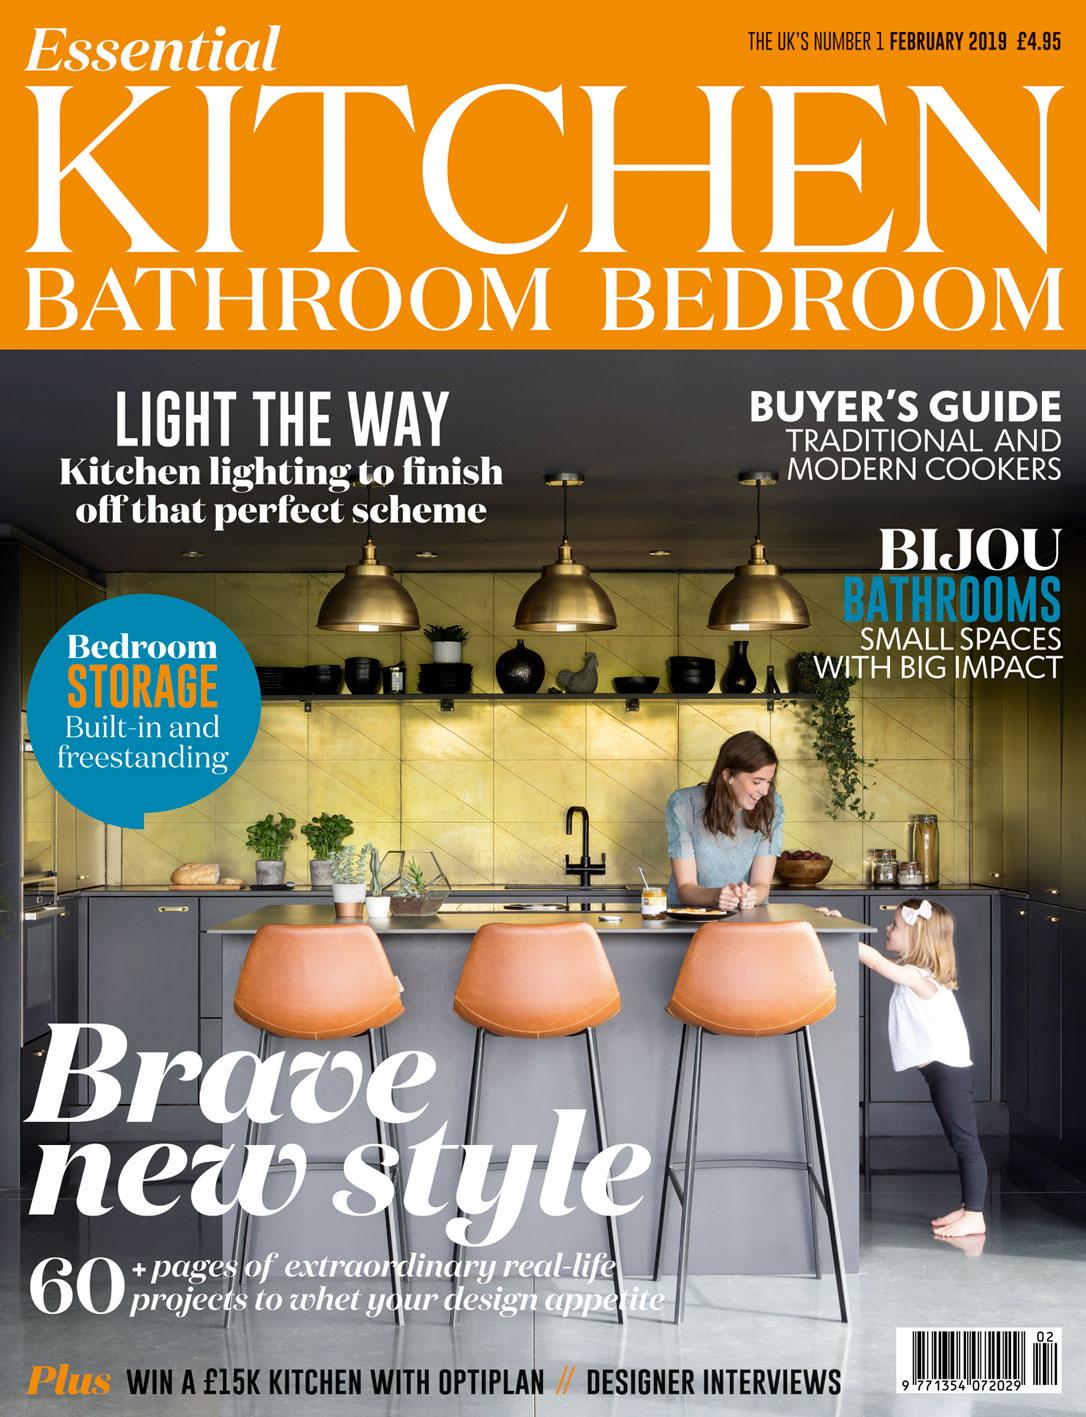 Essential Kitchen Bathroom Bedroom Magazine Cover February 2019 | Paul Craig Interior Photographer